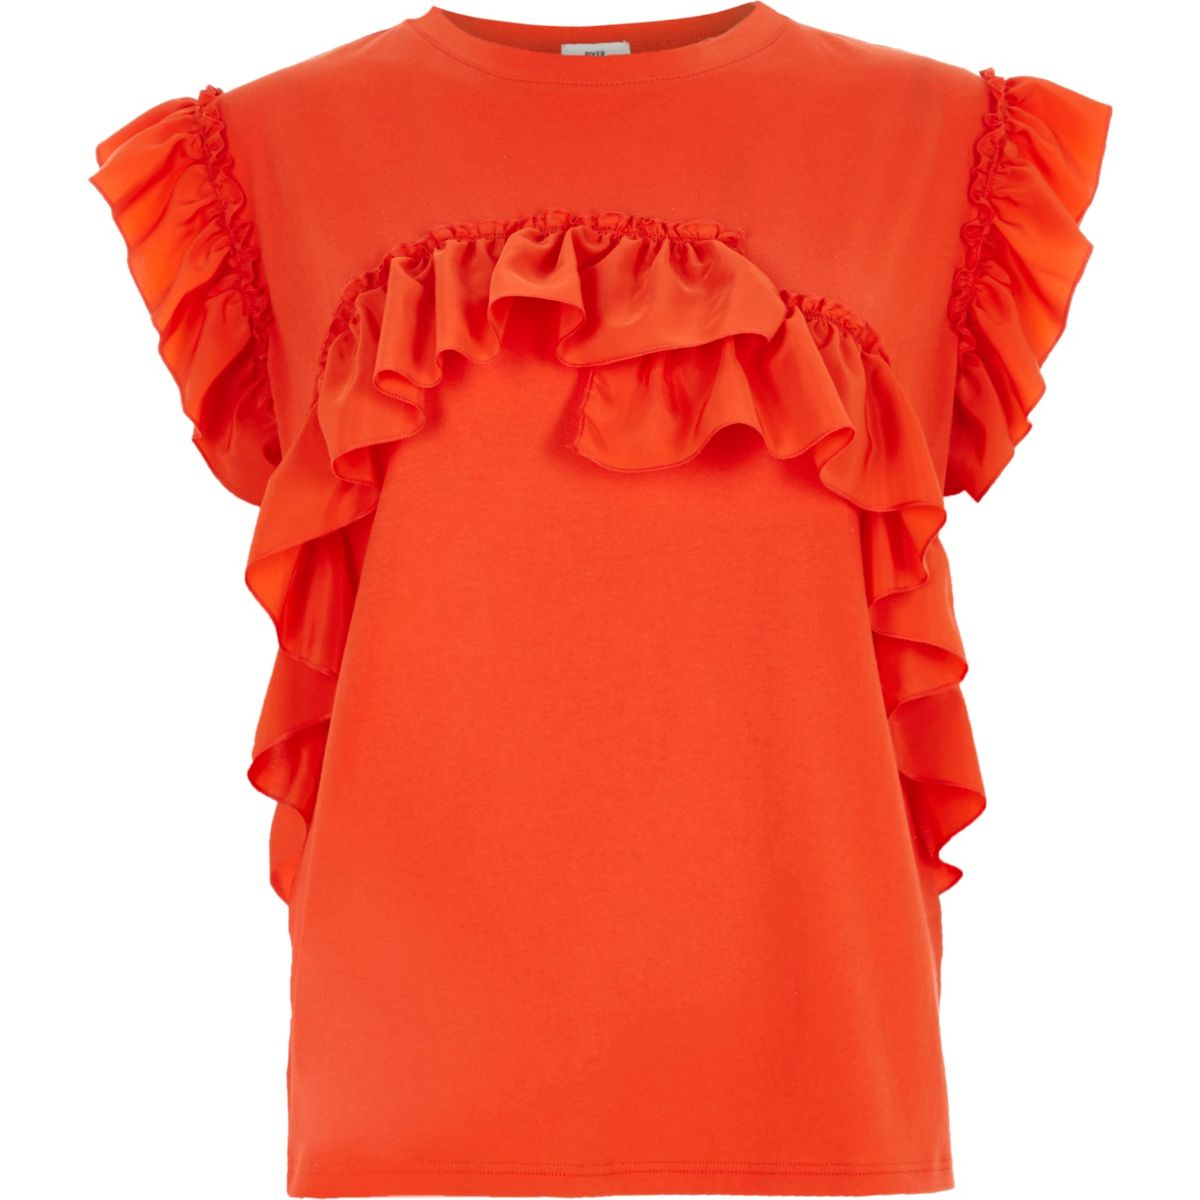 Orange frill T-shirt